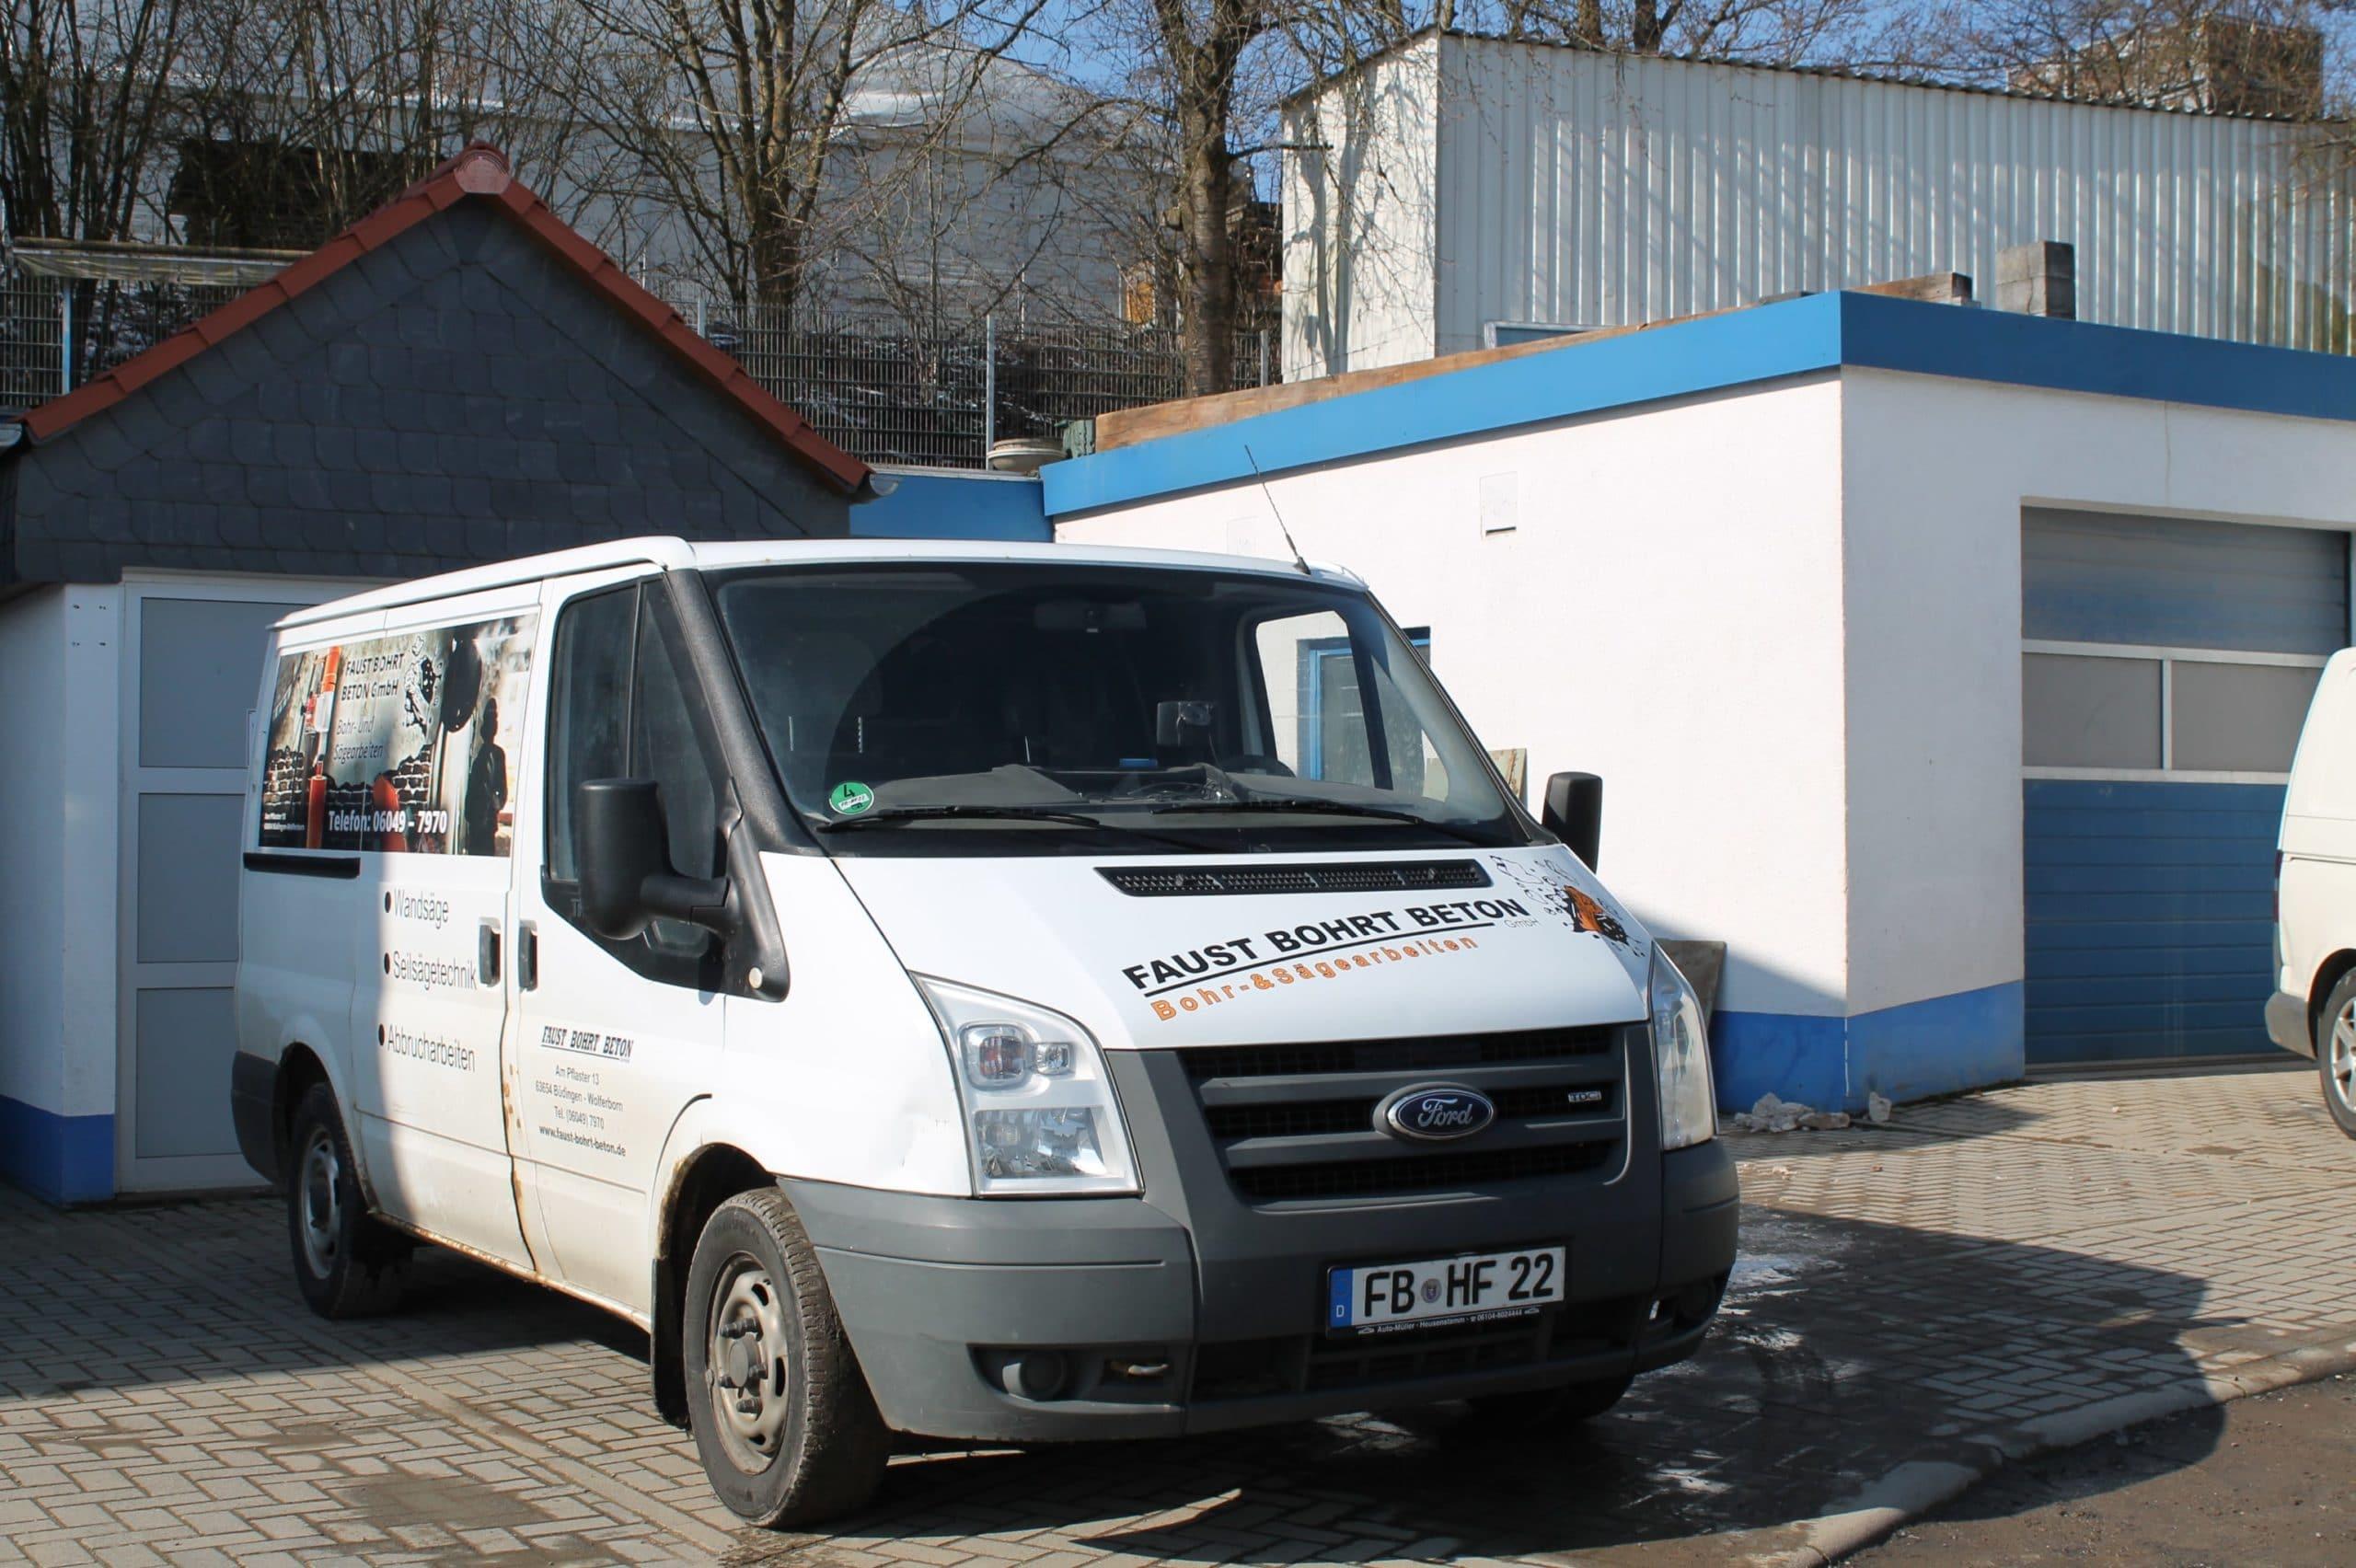 Faust bohrt Beton Fuhrpark 2